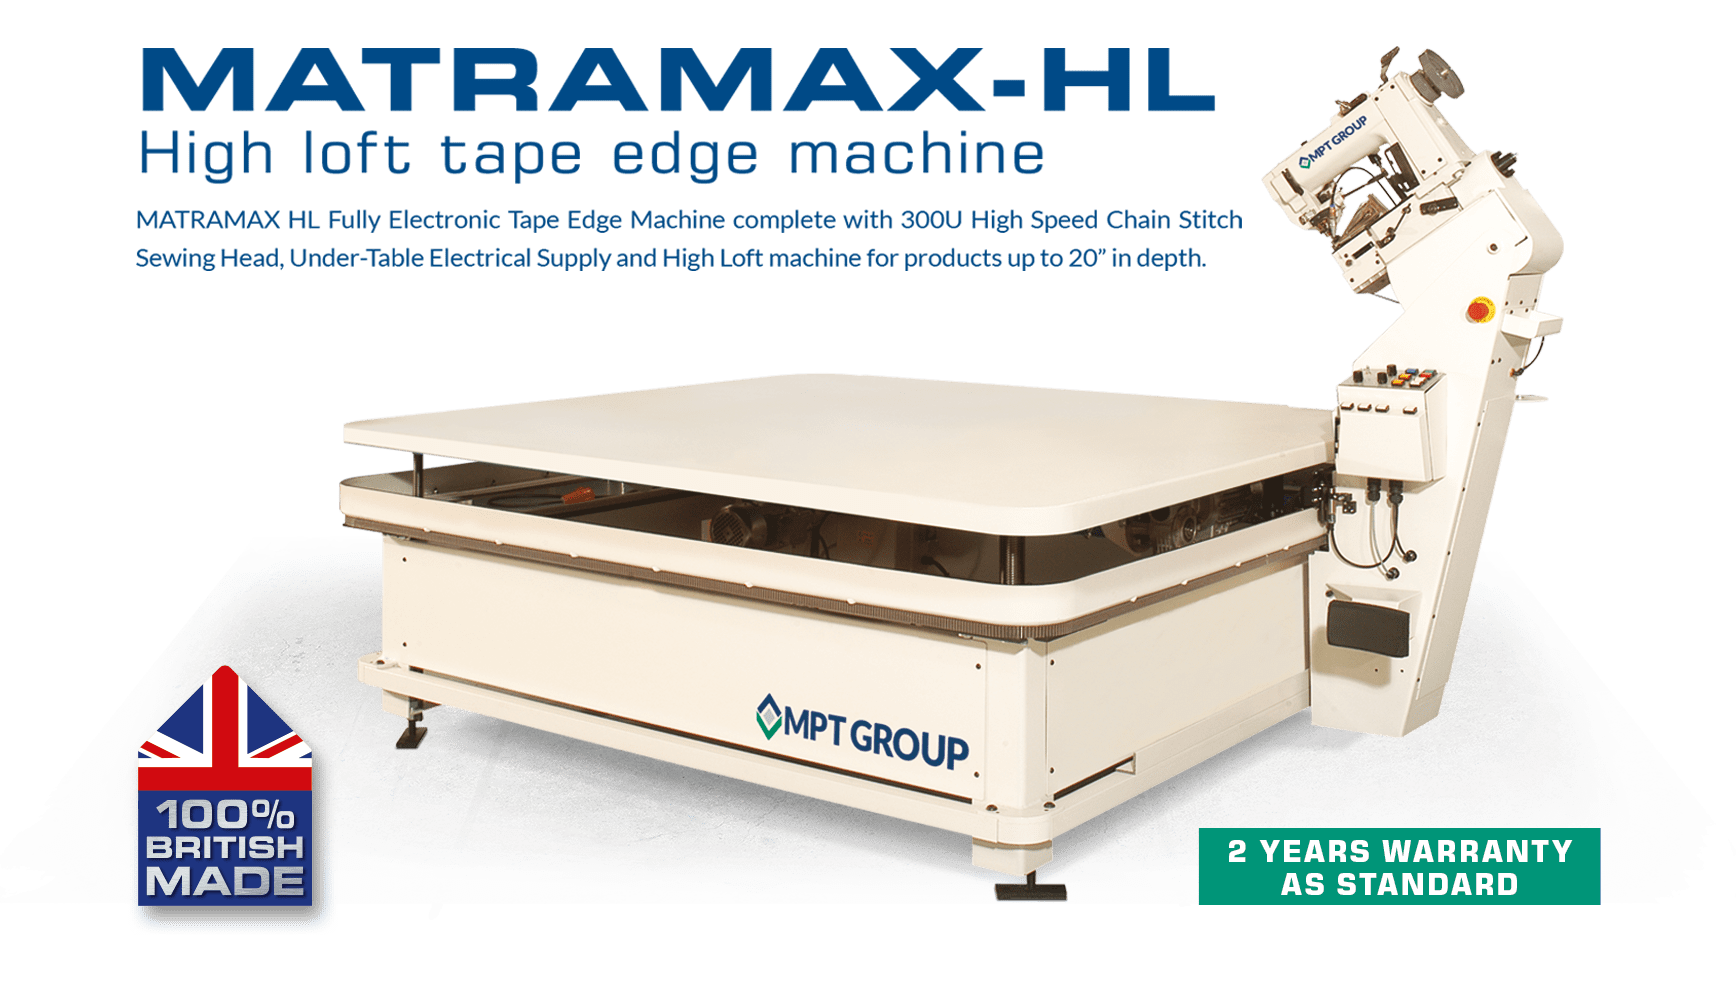 Matramax HL